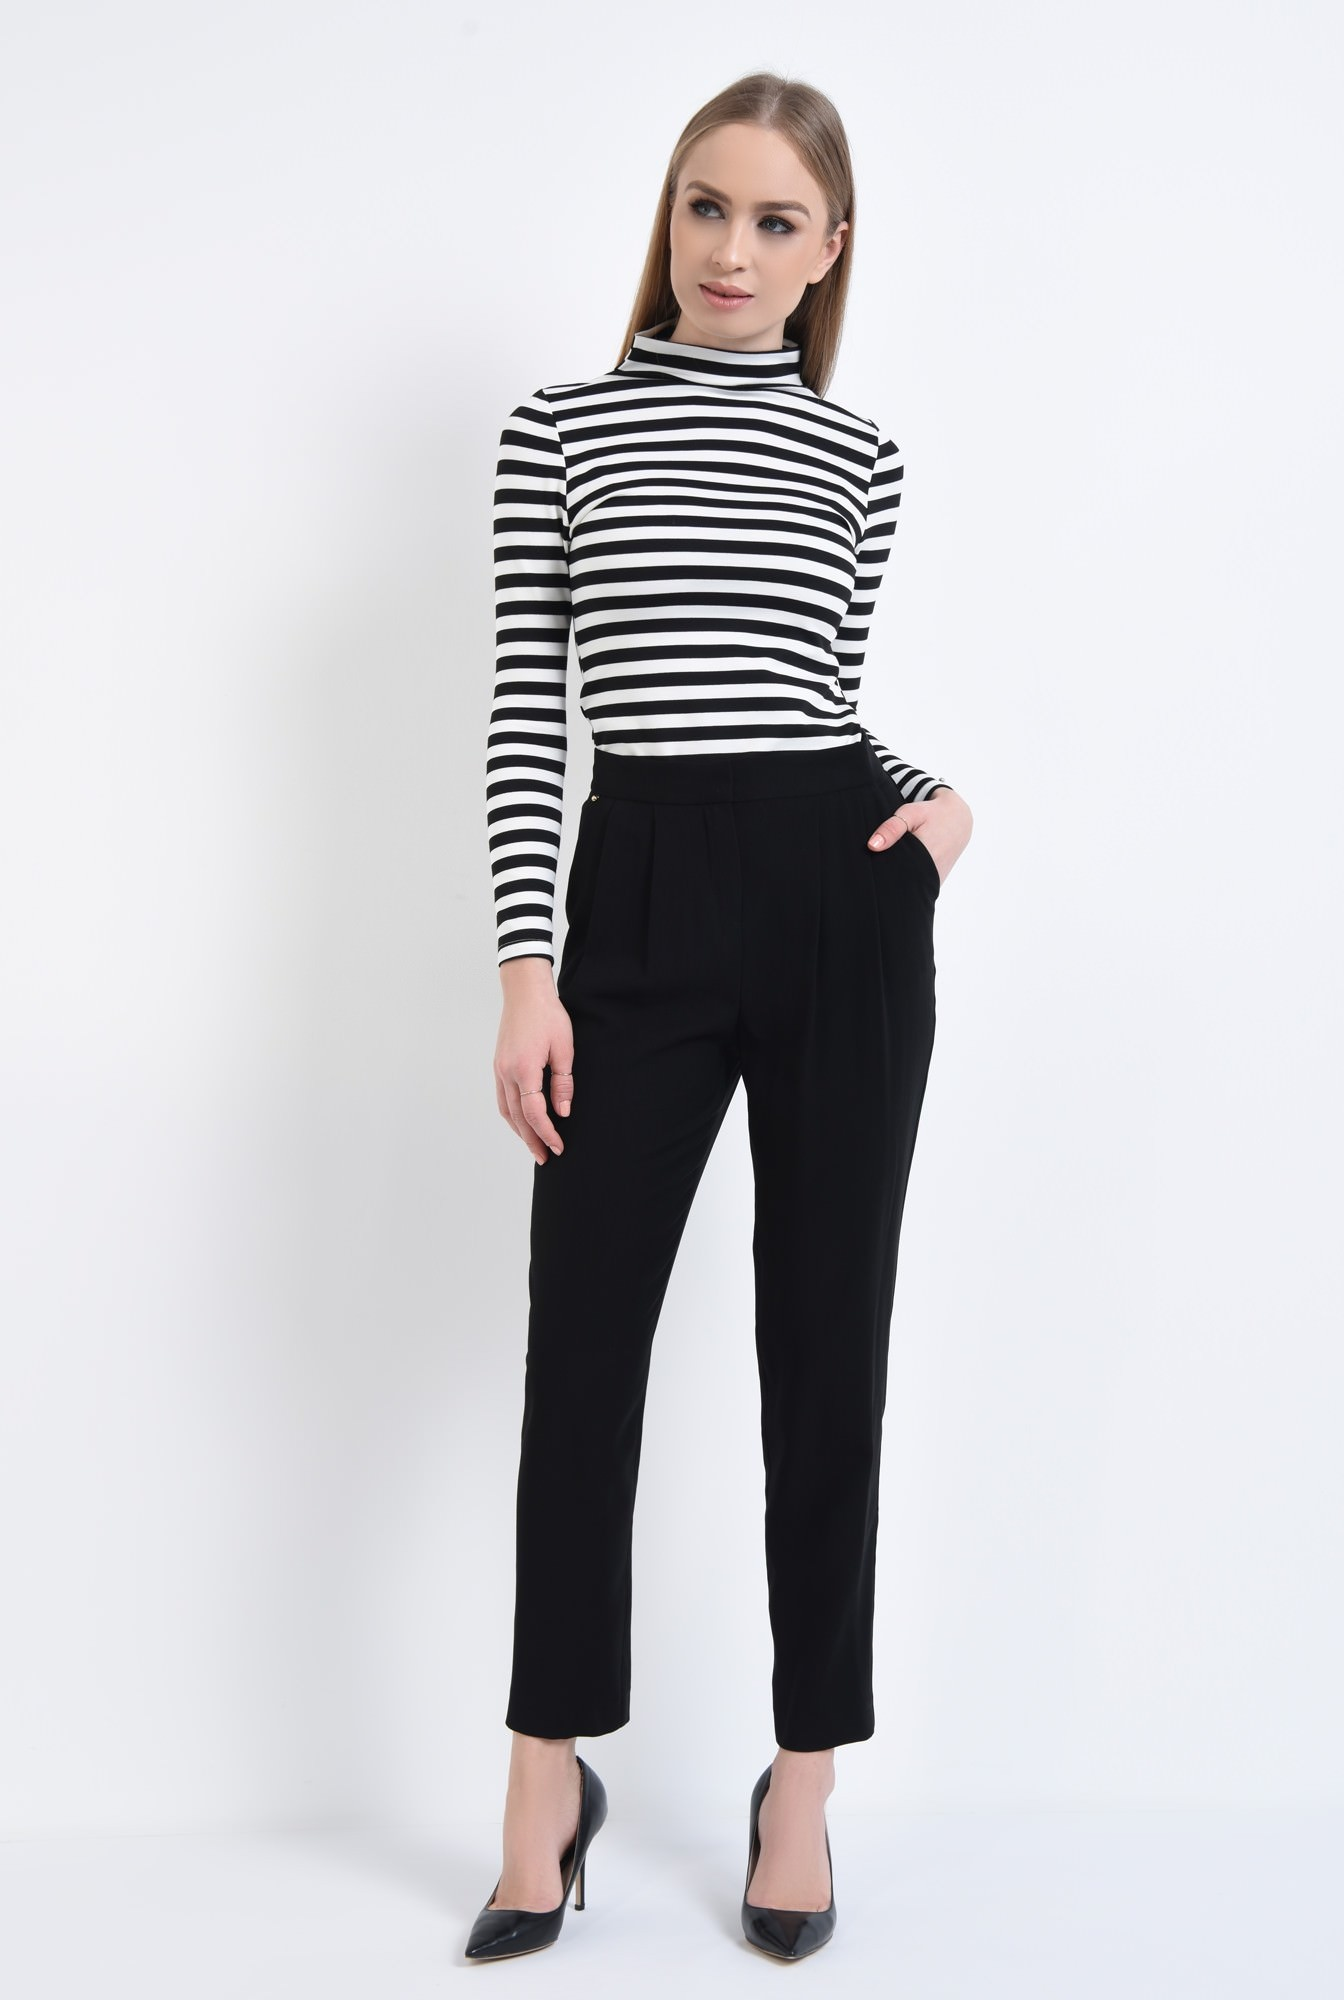 3 - Bluza casual, dungi, alb-negru